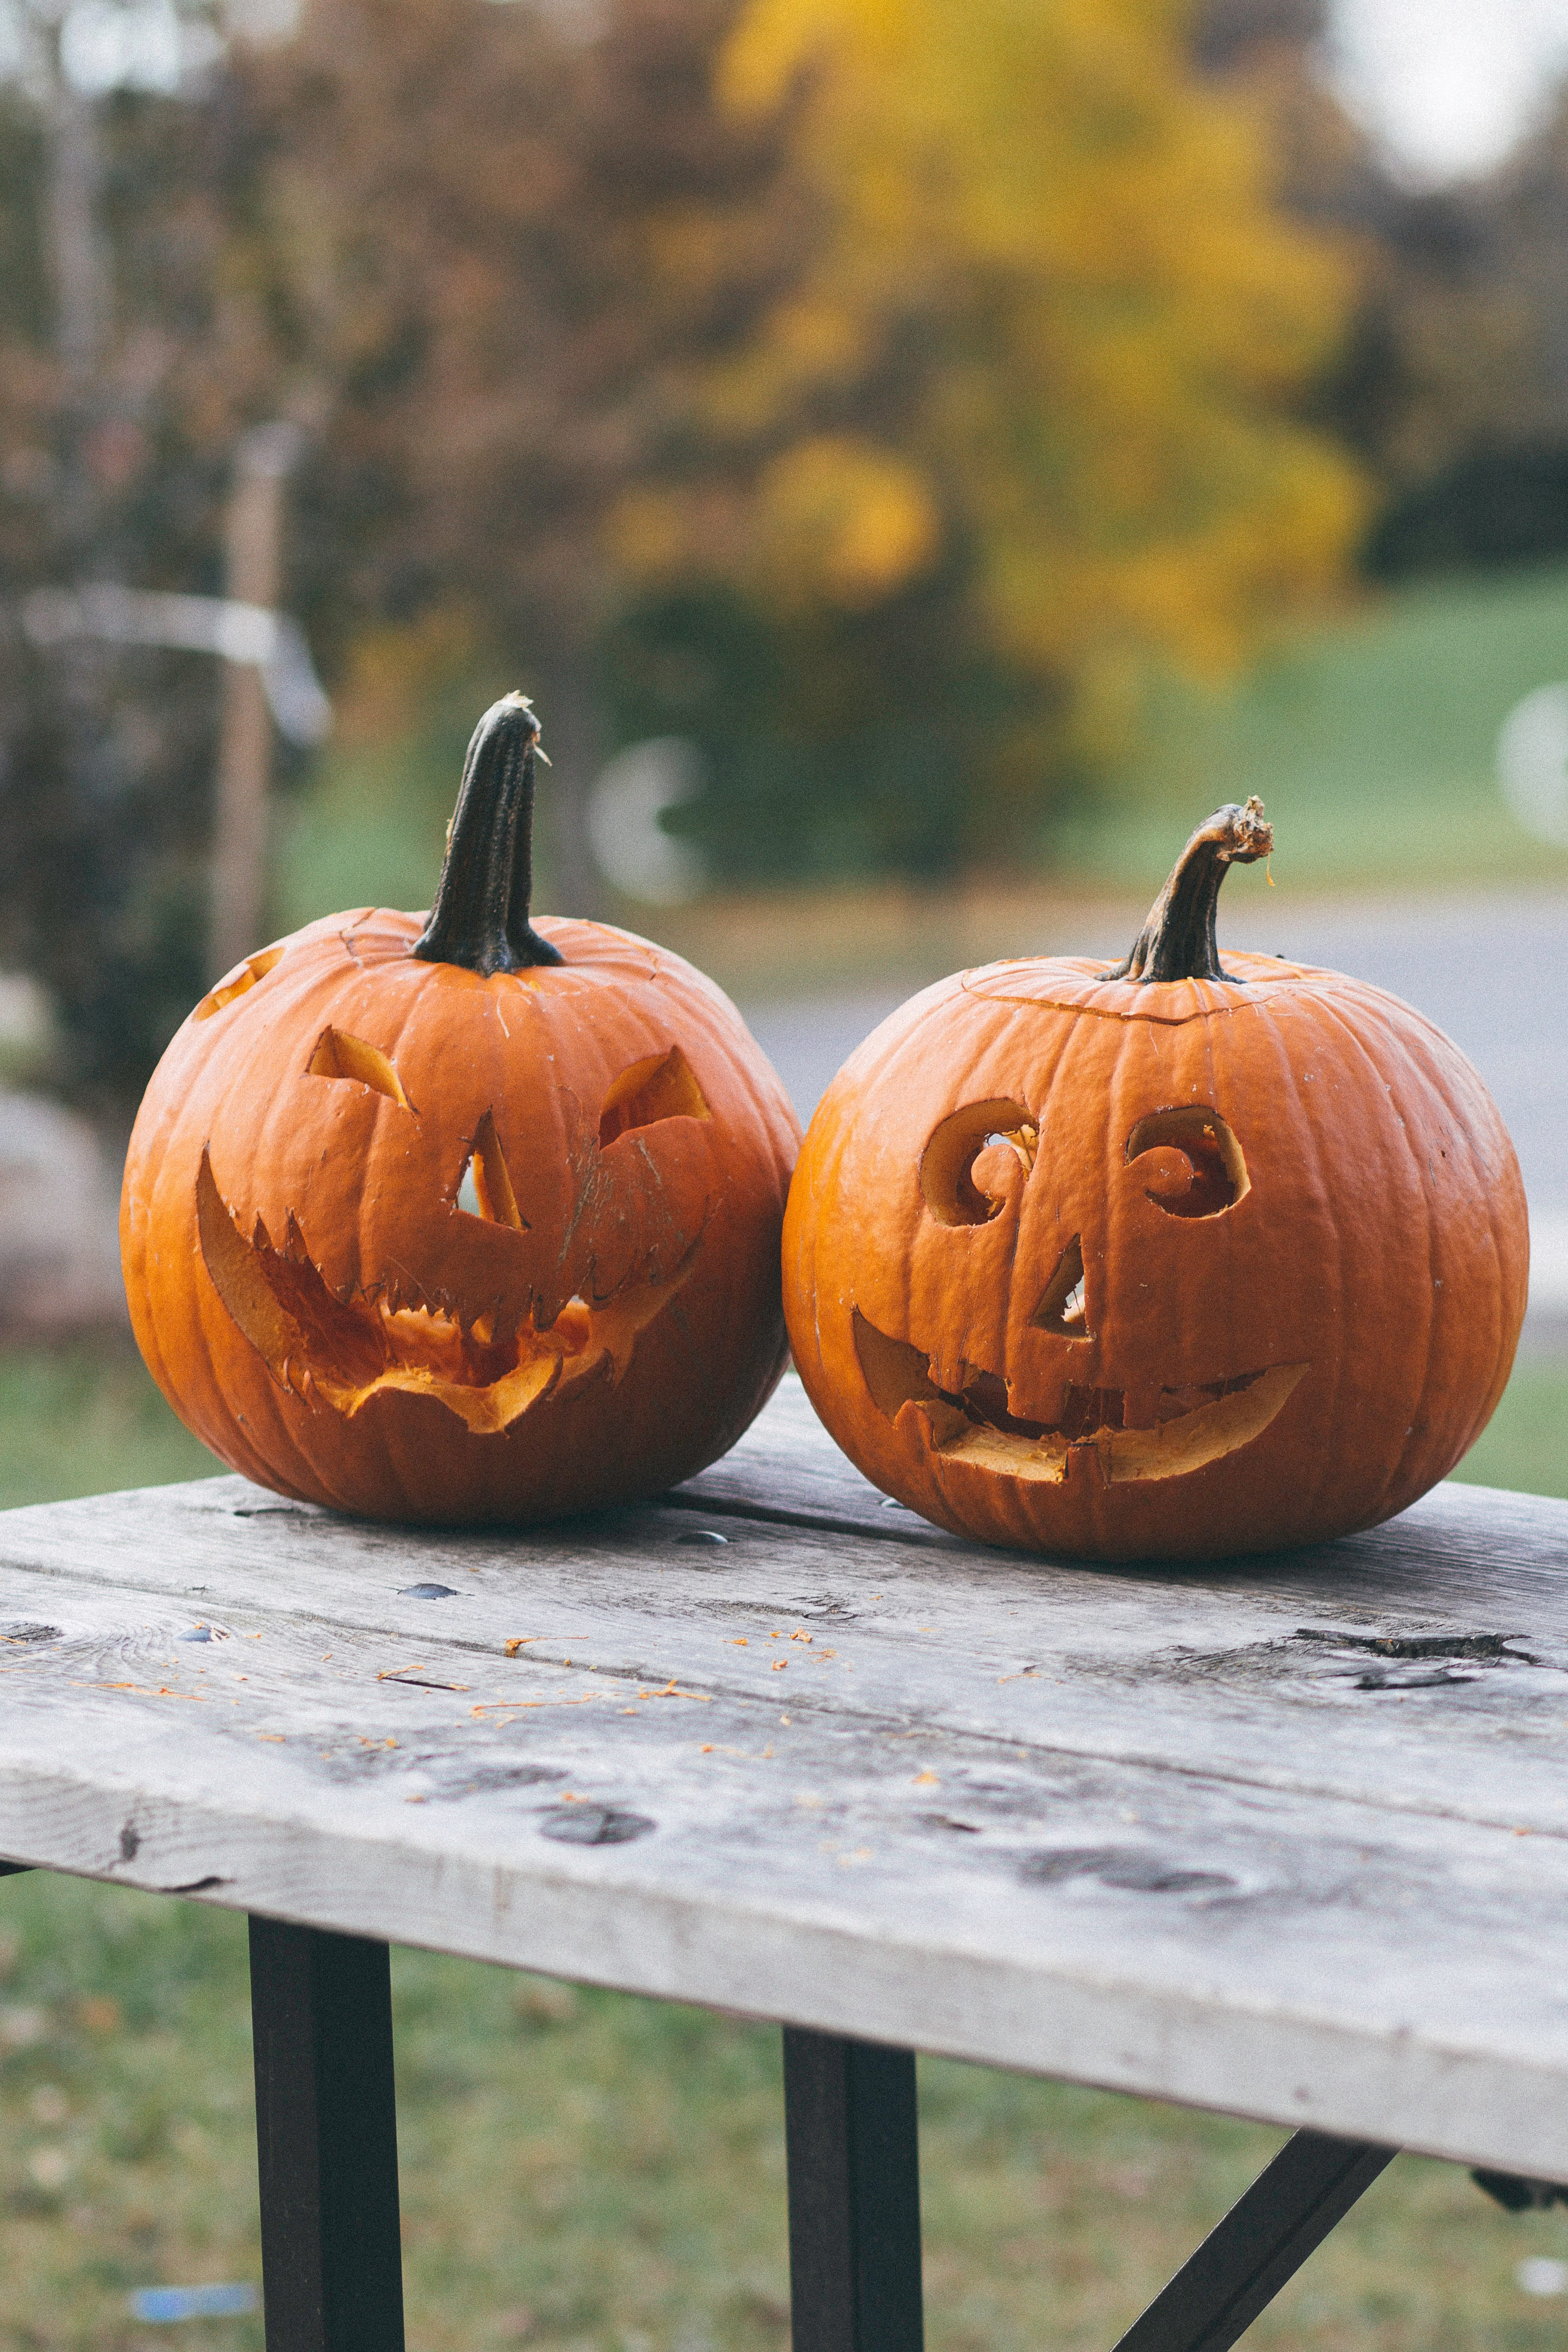 School Bans Halloween Festivities, but Not District-wide